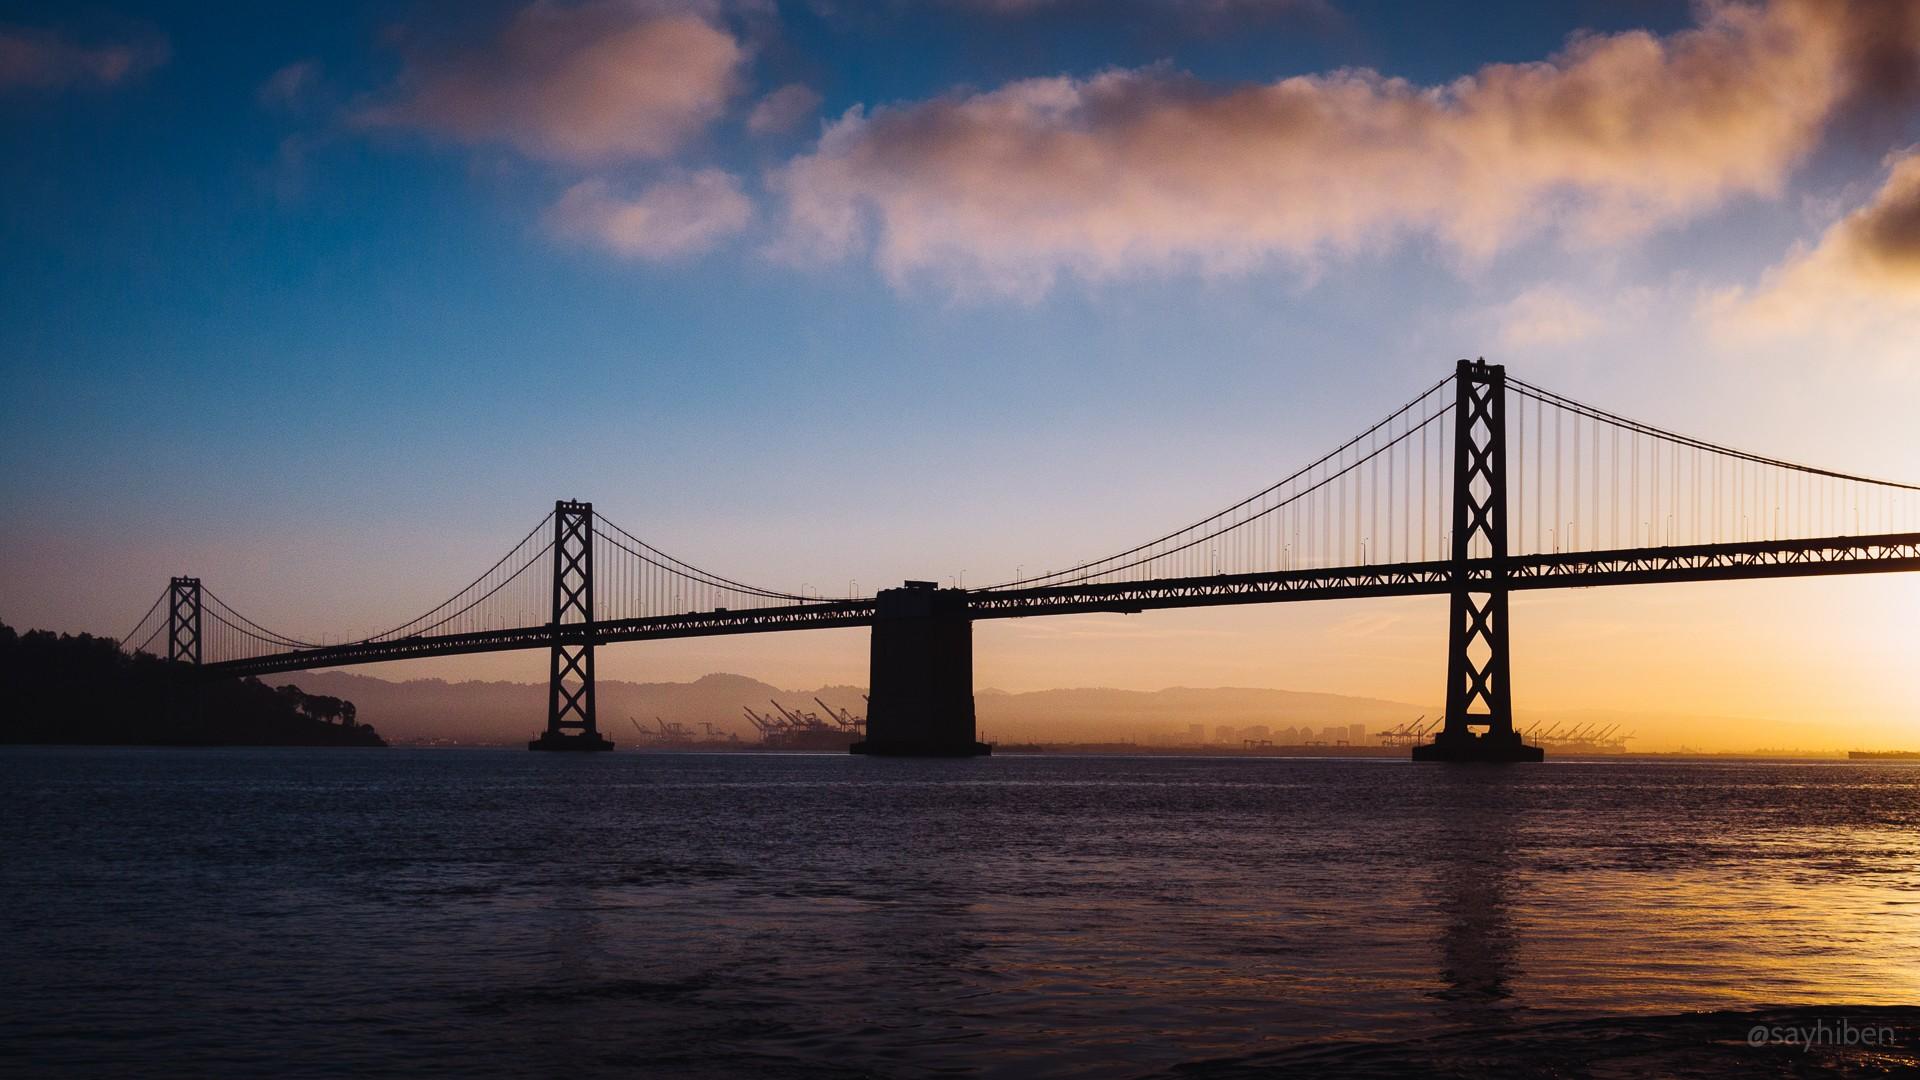 General 1920x1080 San Francisco Bay Bridge bridge clouds sea